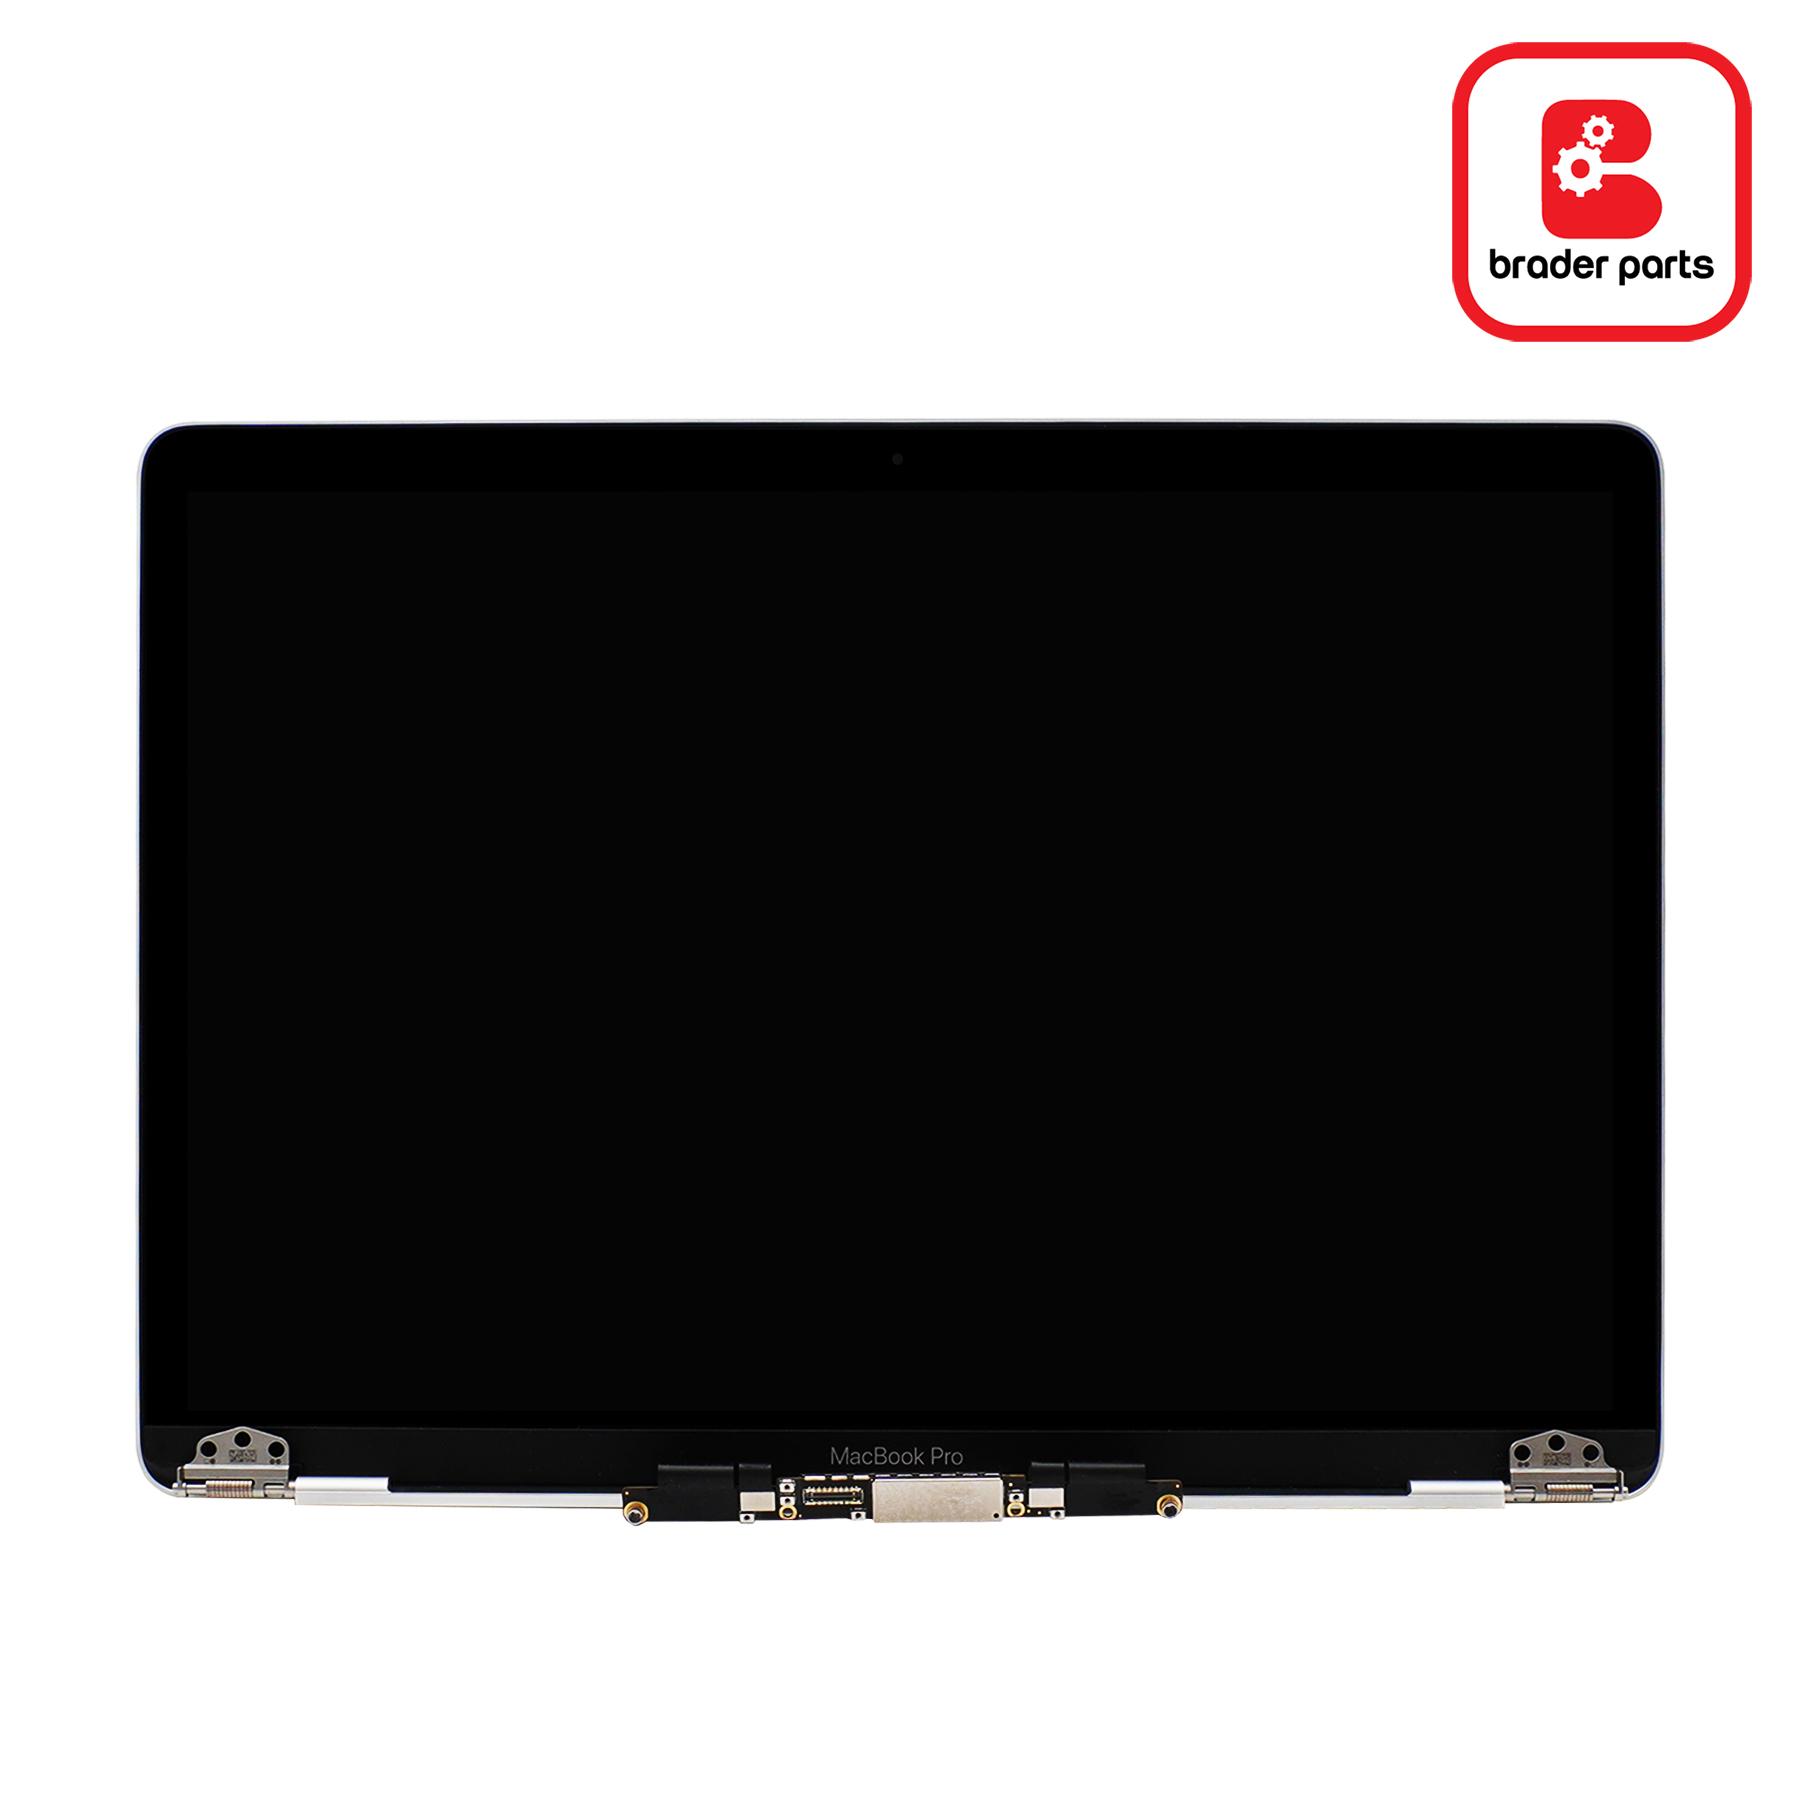 "Lcd Macbook Air Retina 13"" A1932 2018 - 2019"